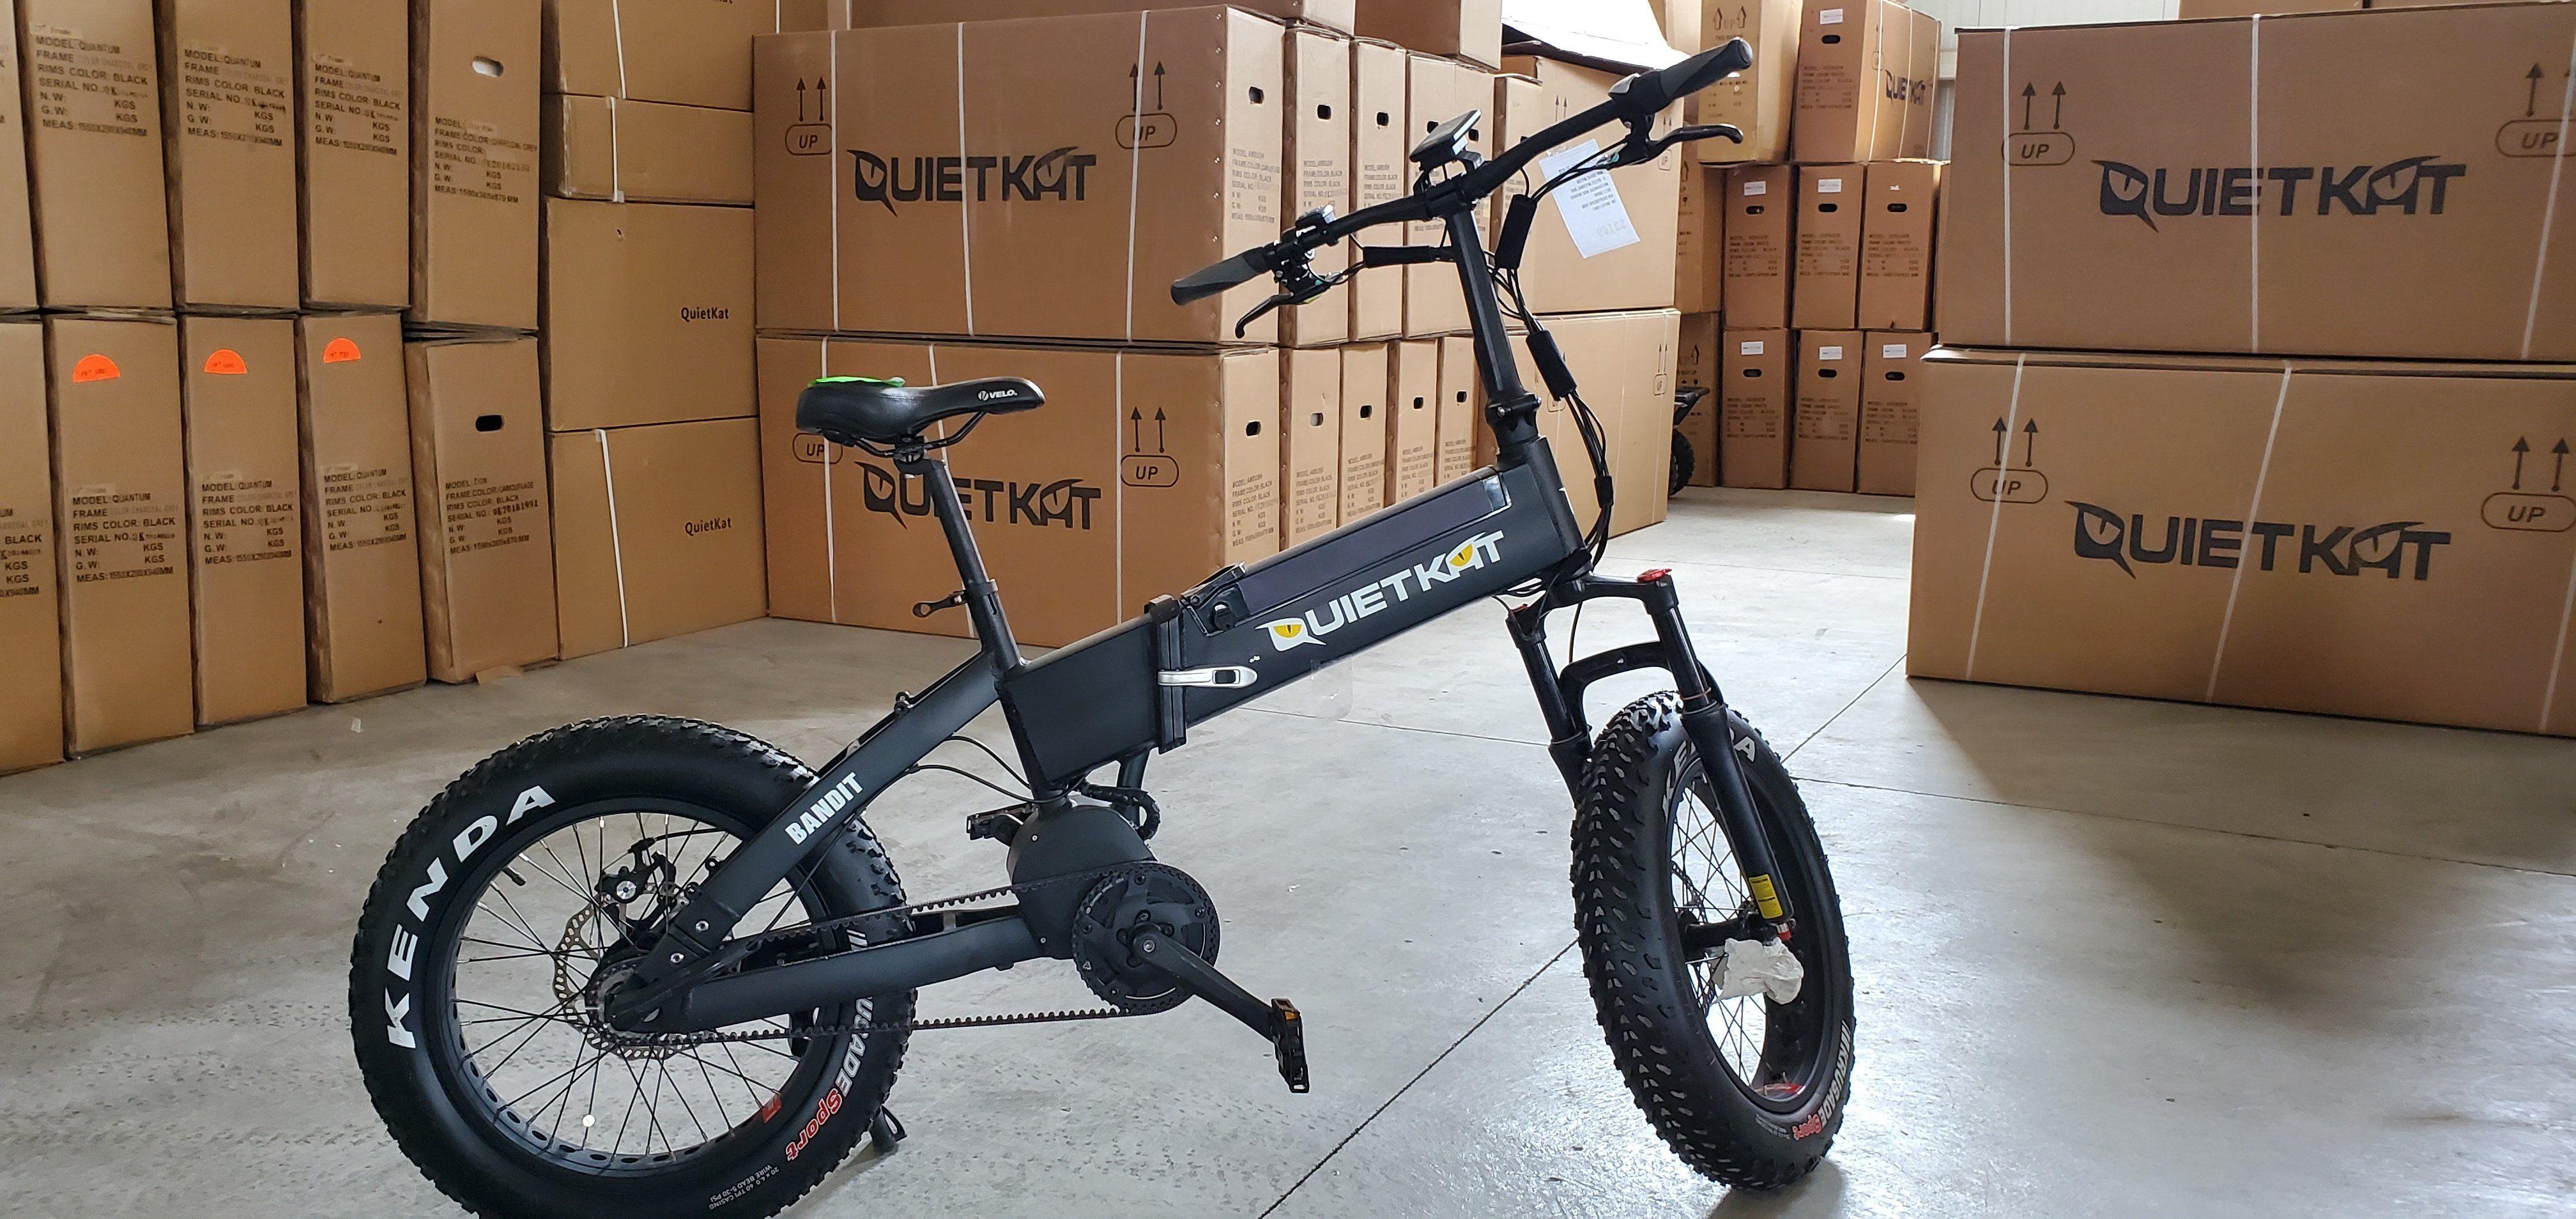 Quietkat 2018 Bandit Folding Electric Bike Demo 987 Electric